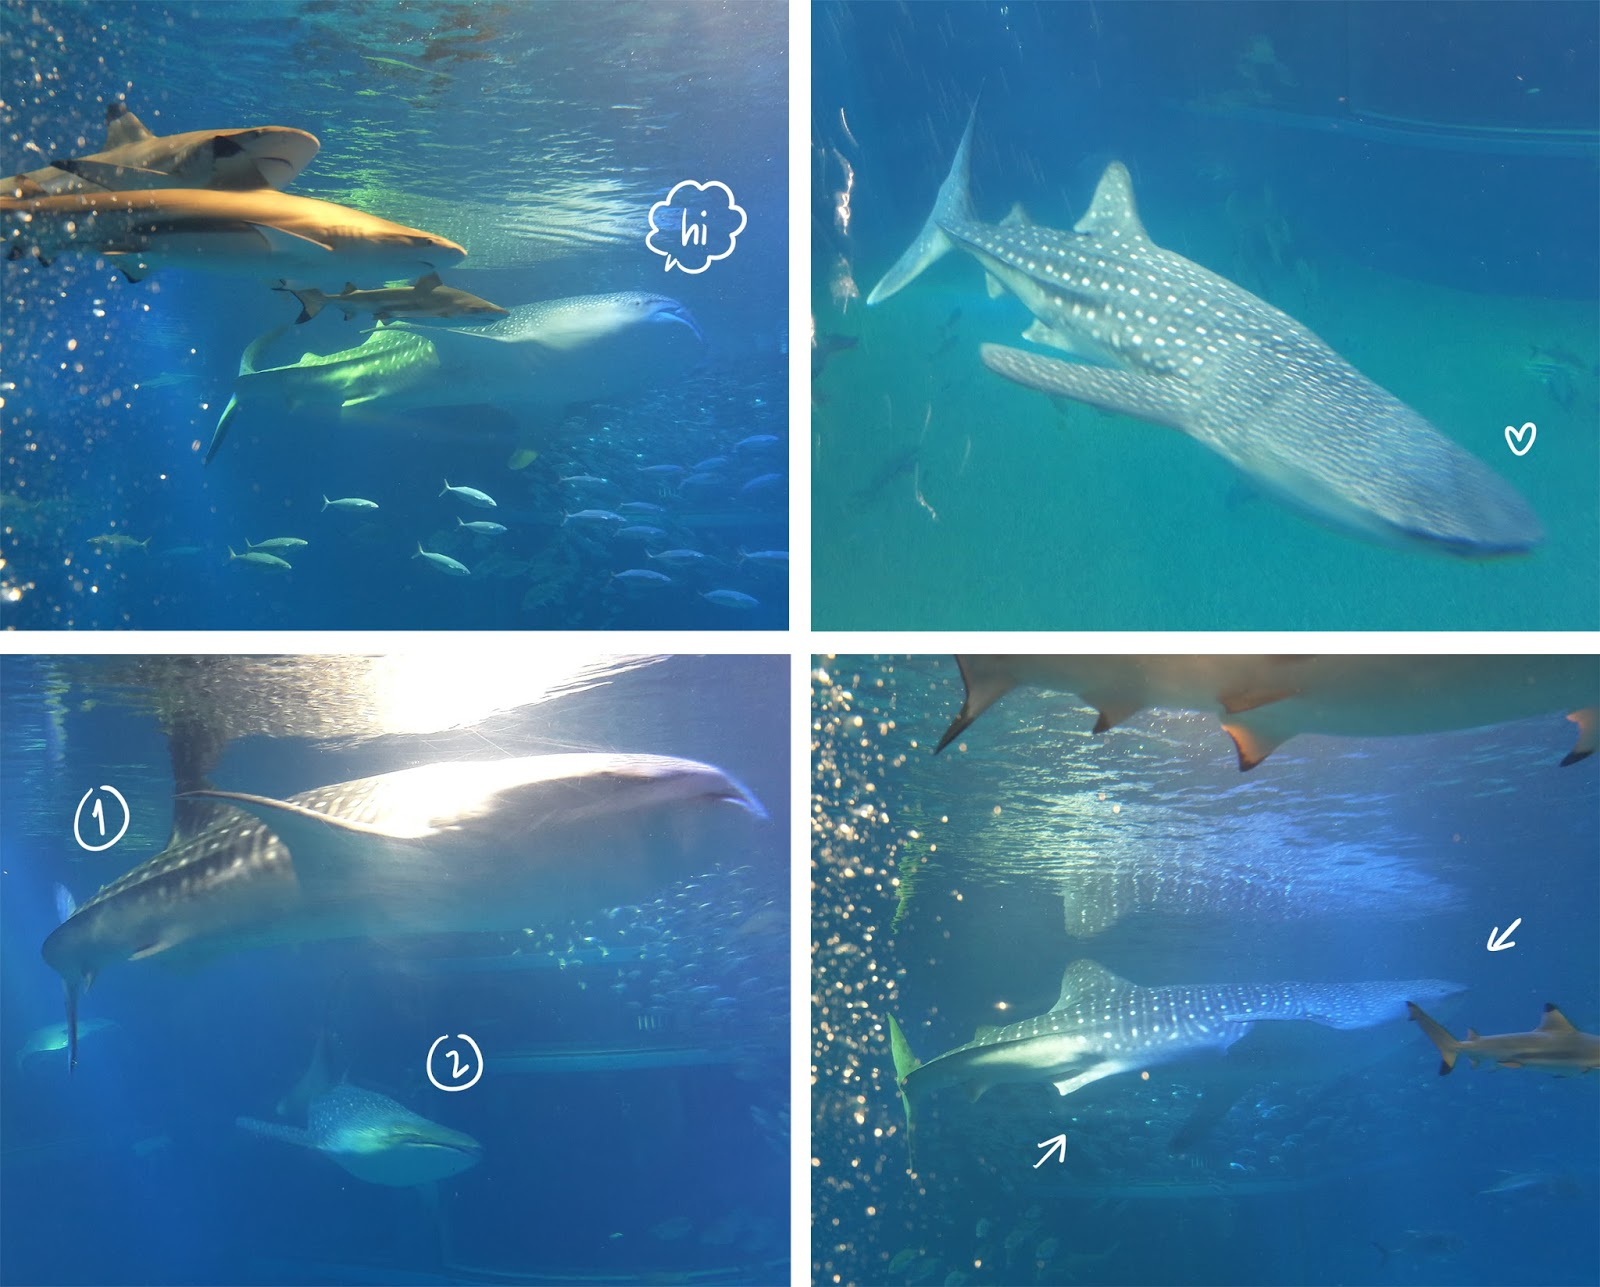 Osaka Aquarium Kaiyukan Whale Shark | www.bigdreamerblog.com